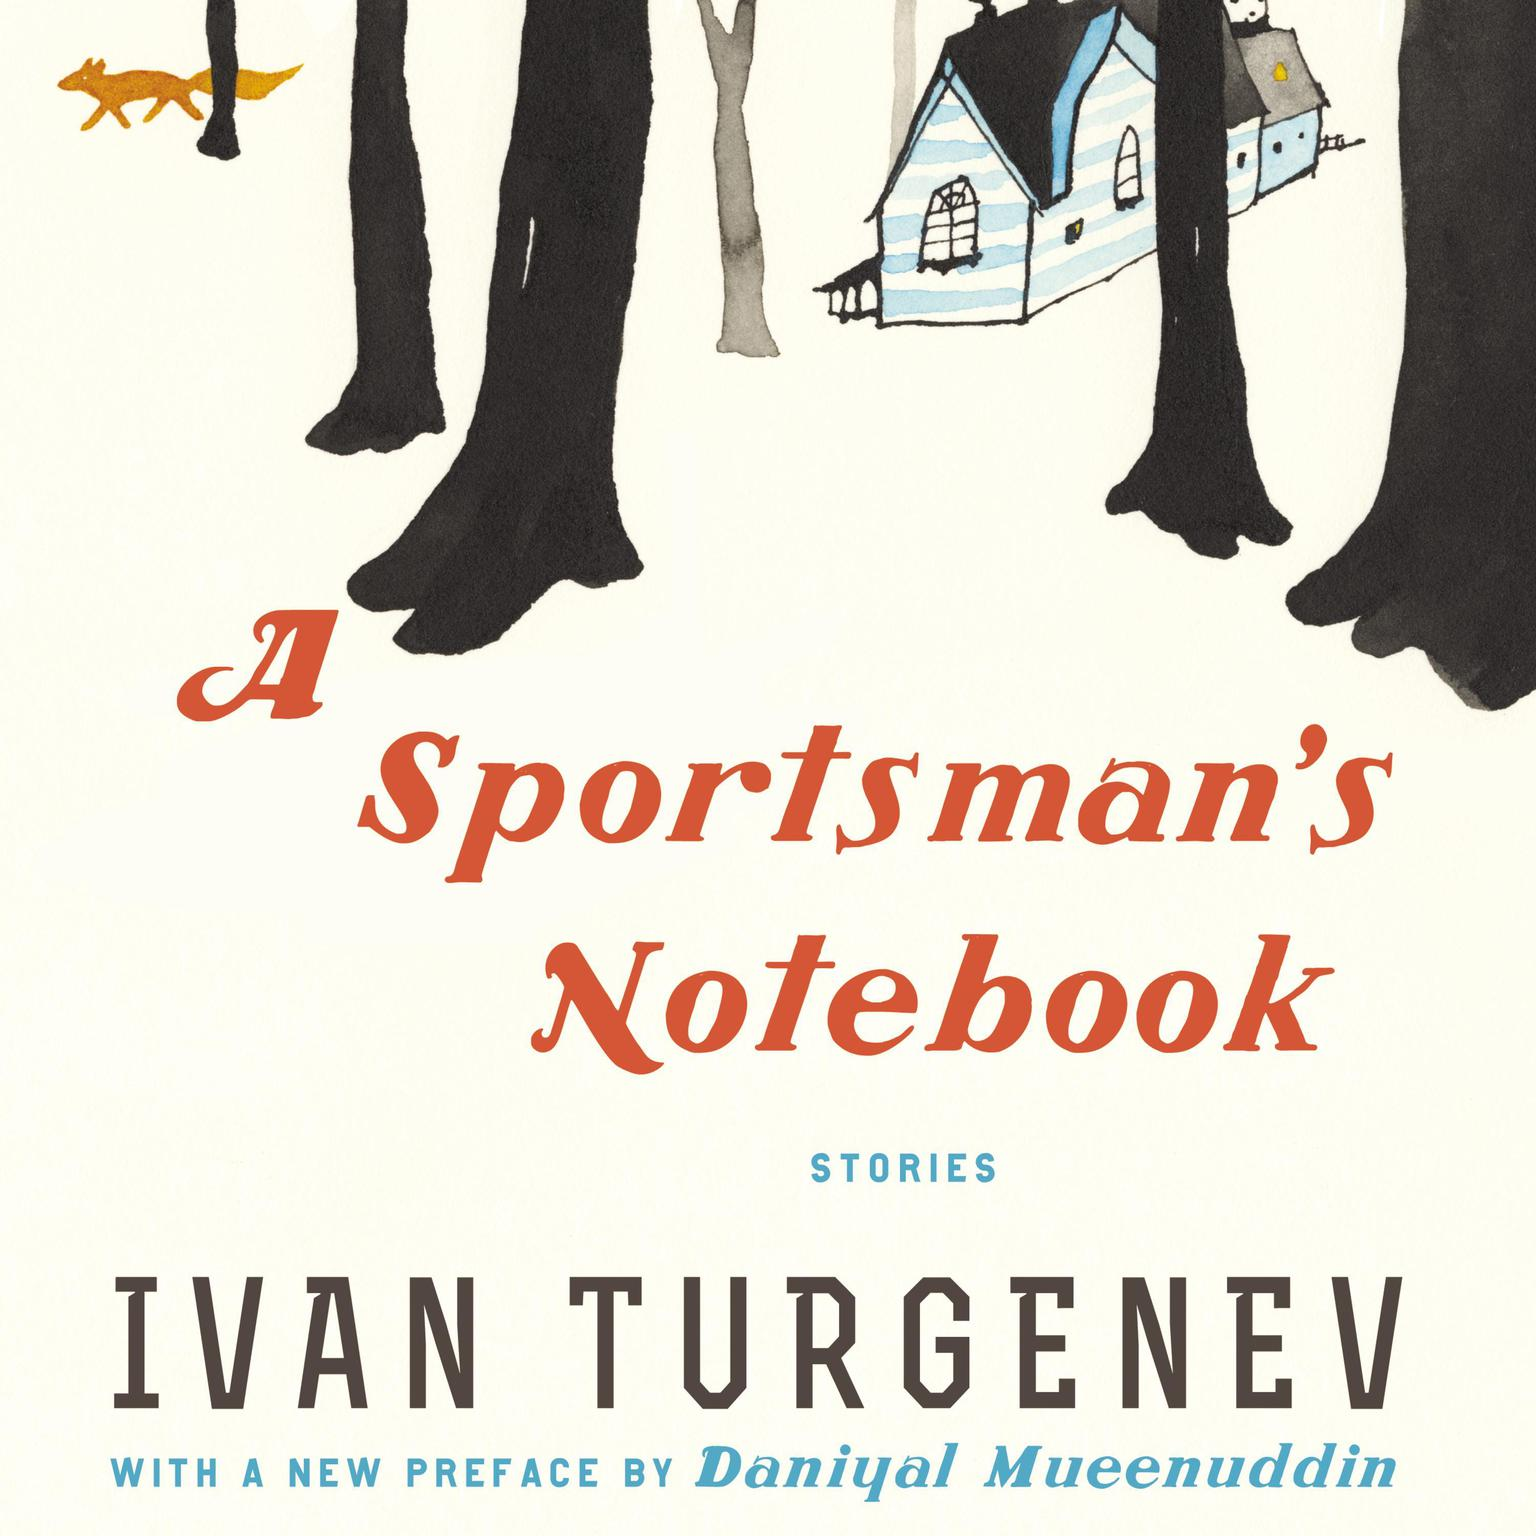 A Sportsmans Notebook: Stories Audiobook, by Ivan Turgenev